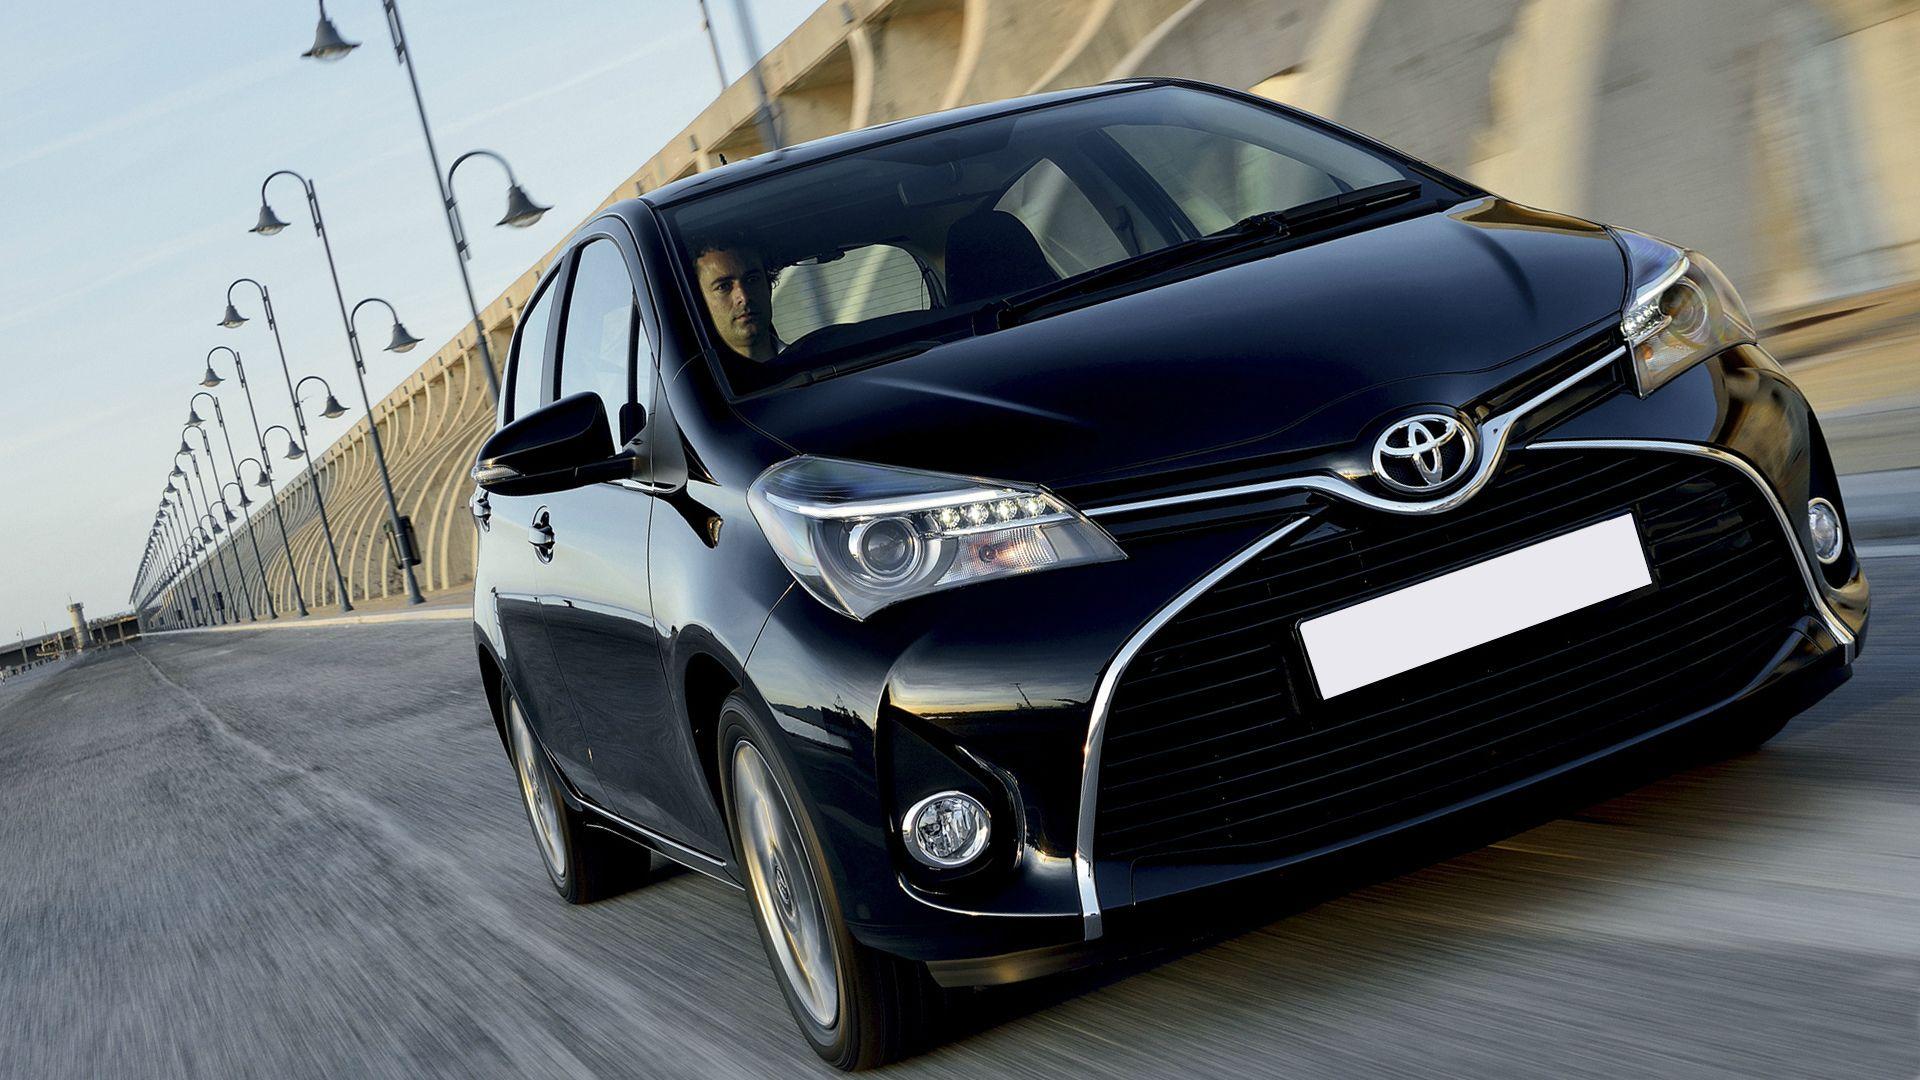 toyota yaris  south africa toyota cars review release raiacarscom